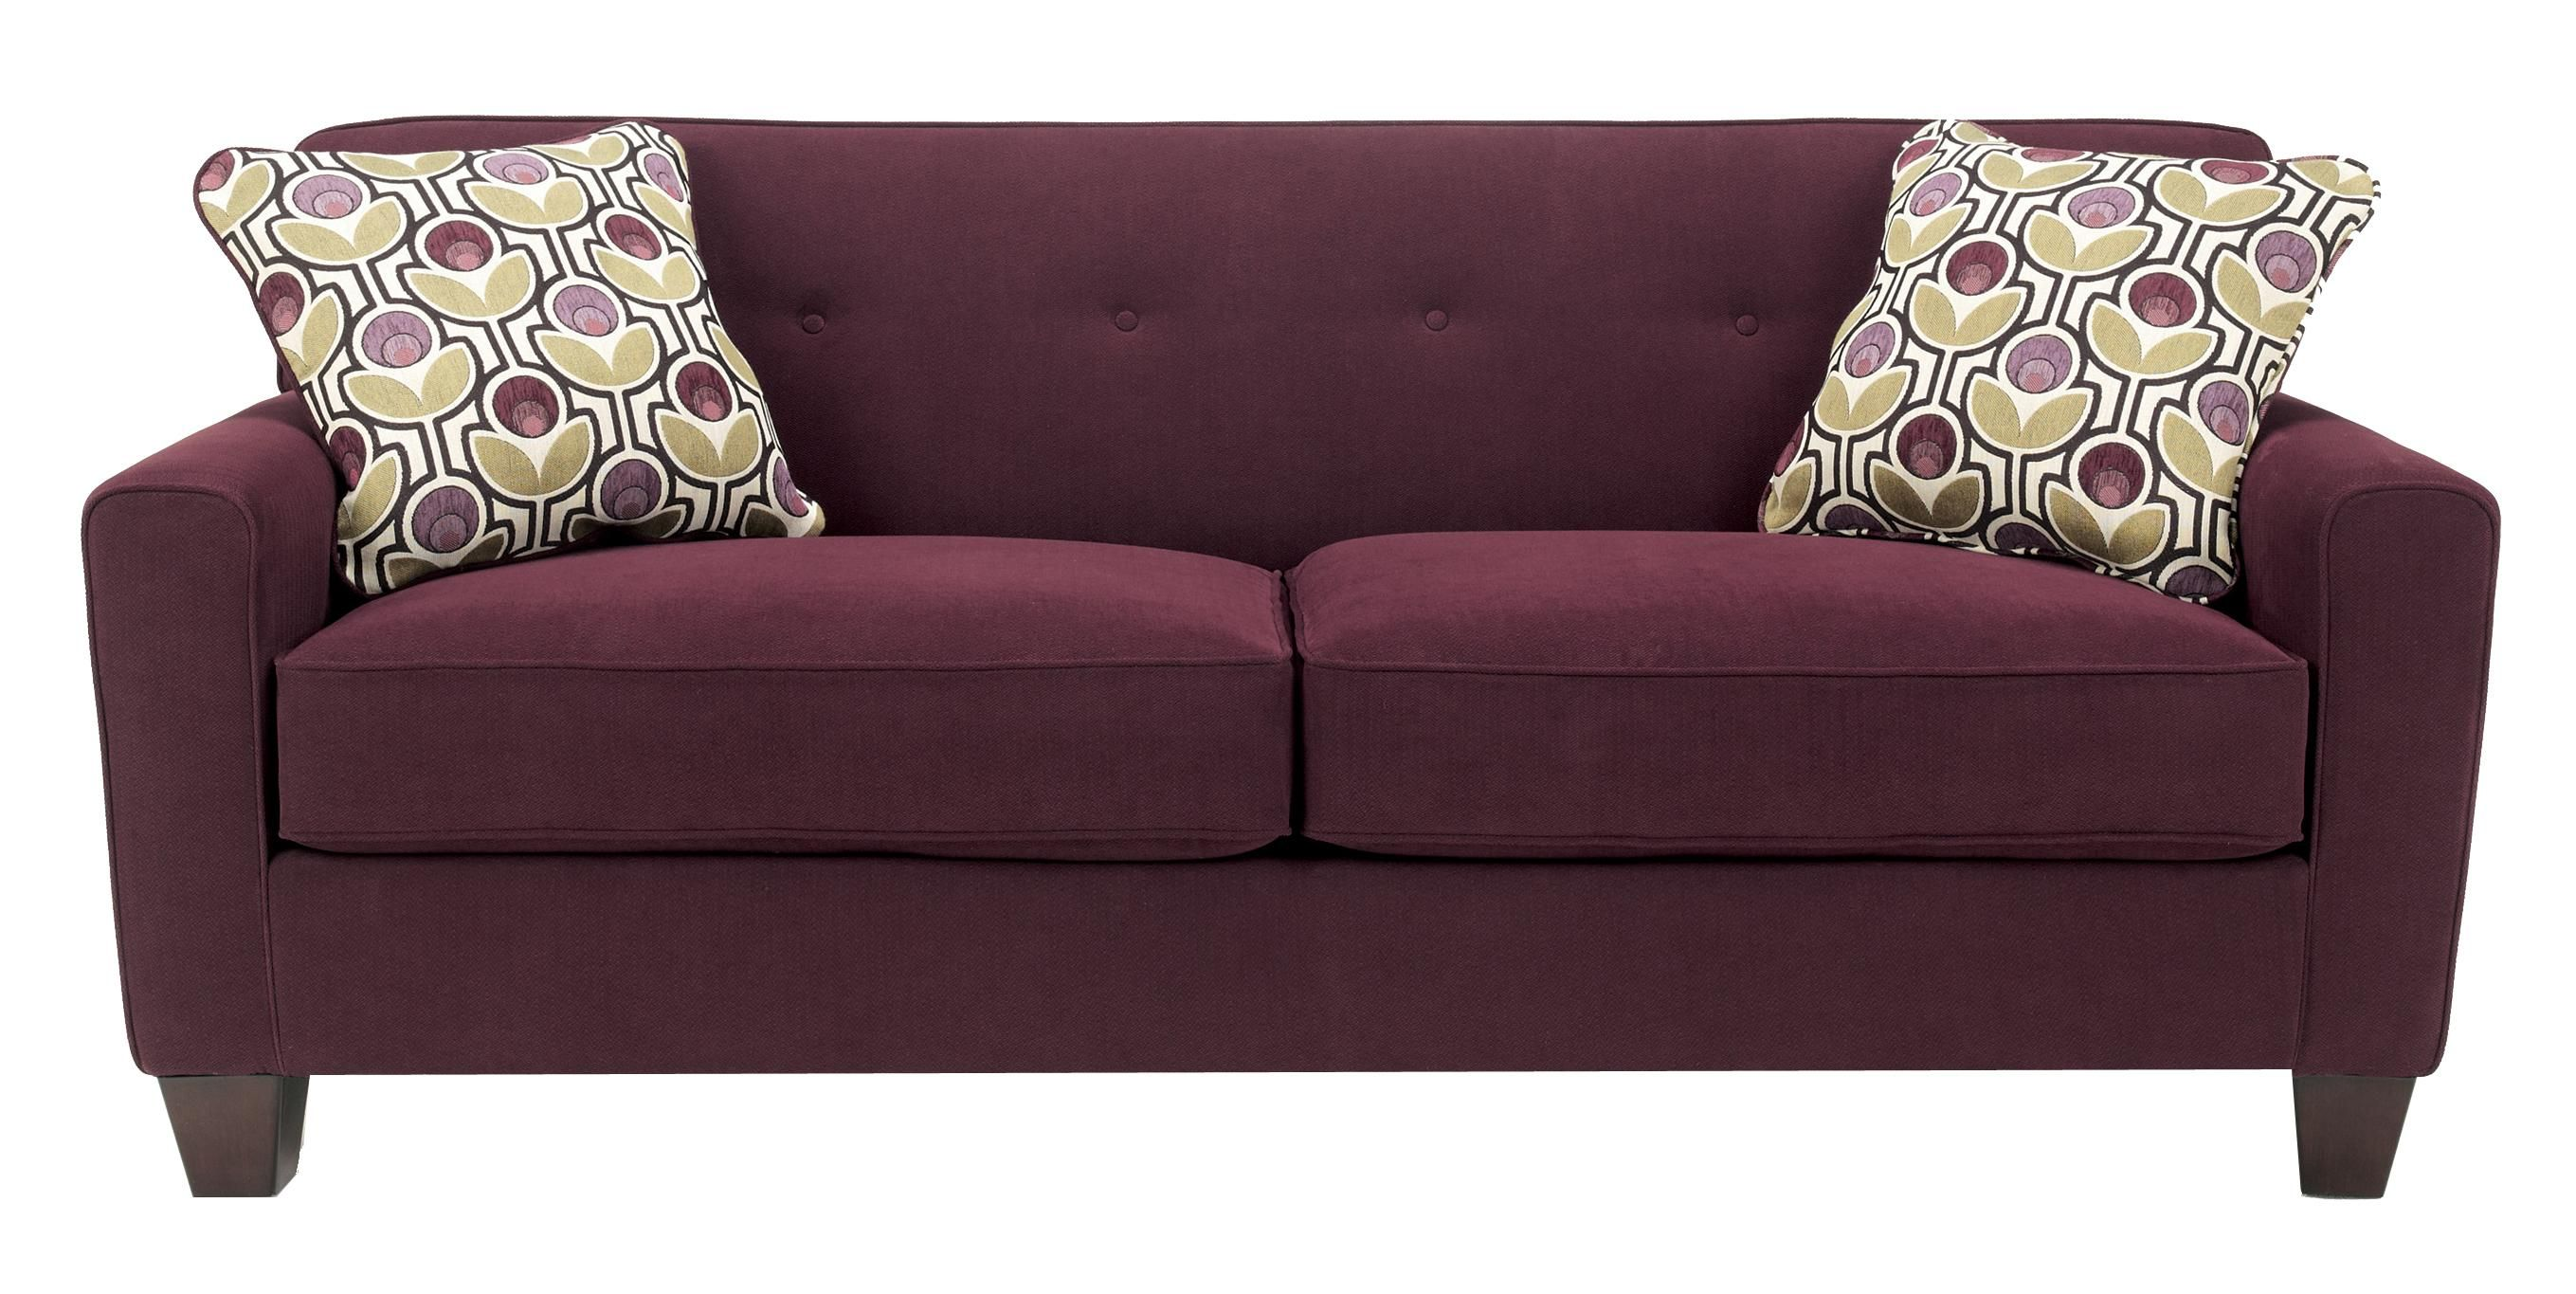 Danielle Eggplant Contemporary Stationary Sofa with Wood  : 4b4c57bd25009a1610c8b633b2436b52 from www.pinterest.com size 2718 x 1365 jpeg 385kB